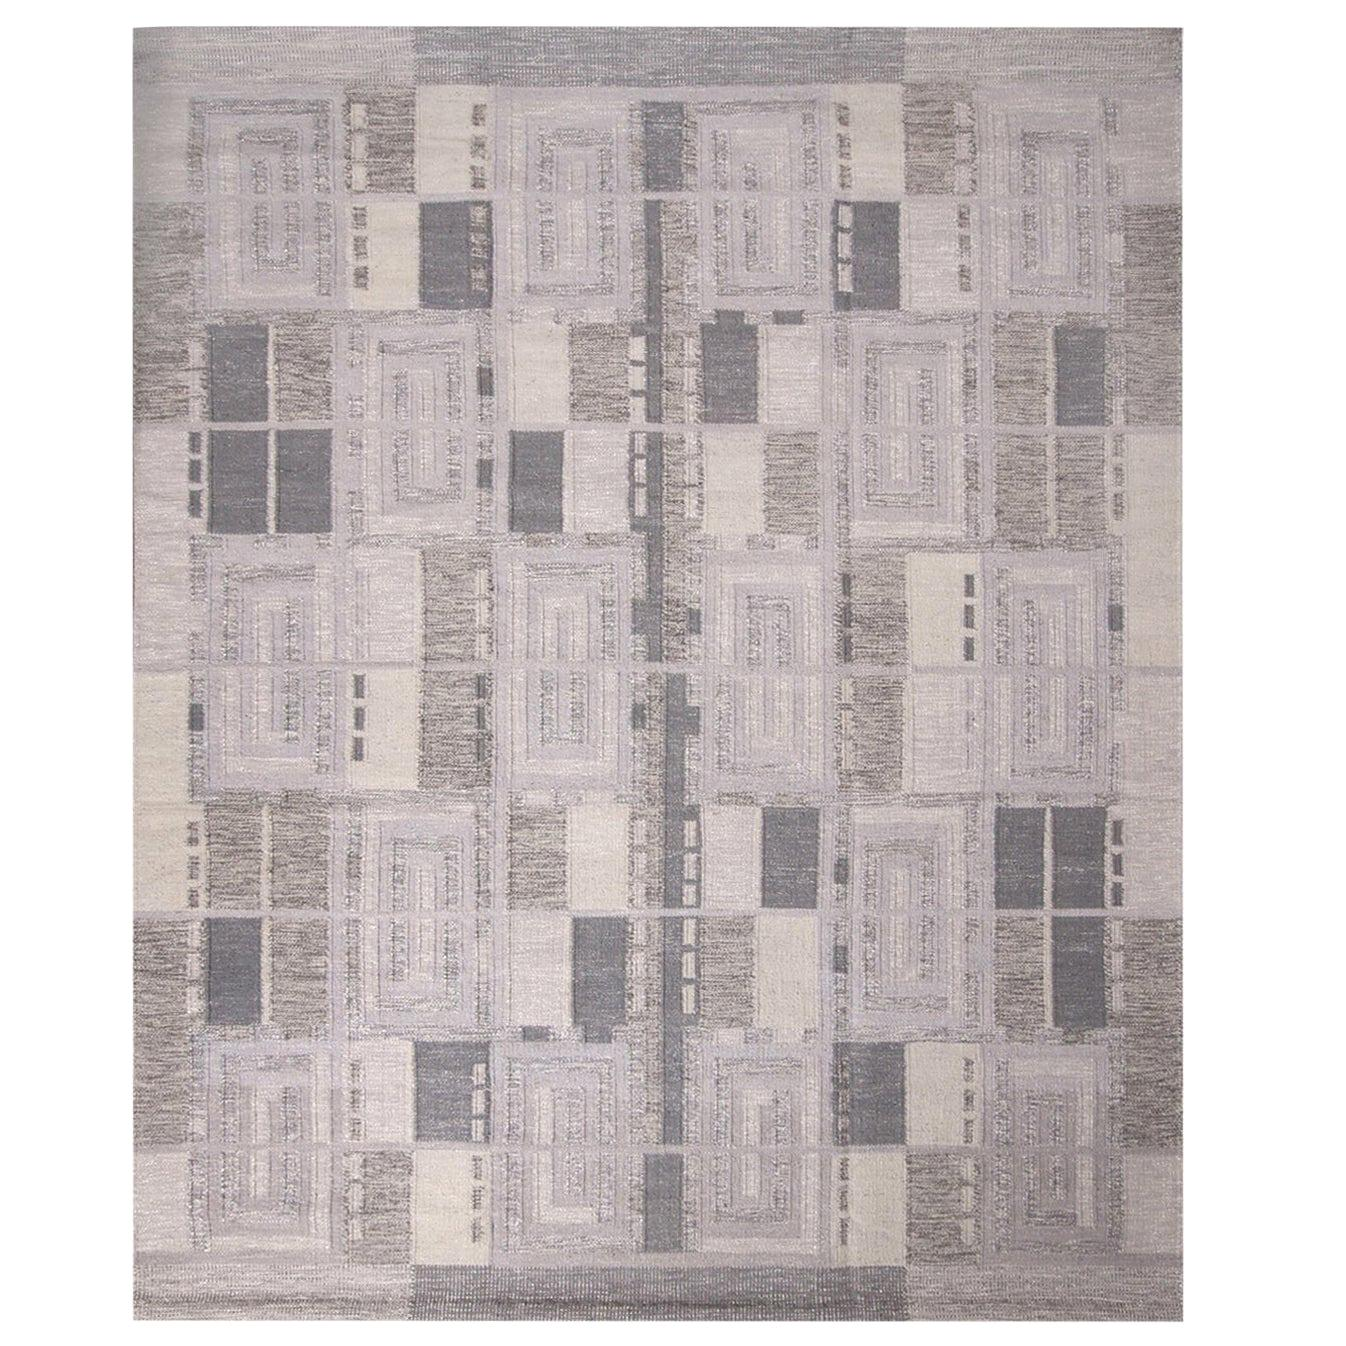 Rug & Kilim's Scandinavian Inspired Geometric Gray and White Wool Pile Rug